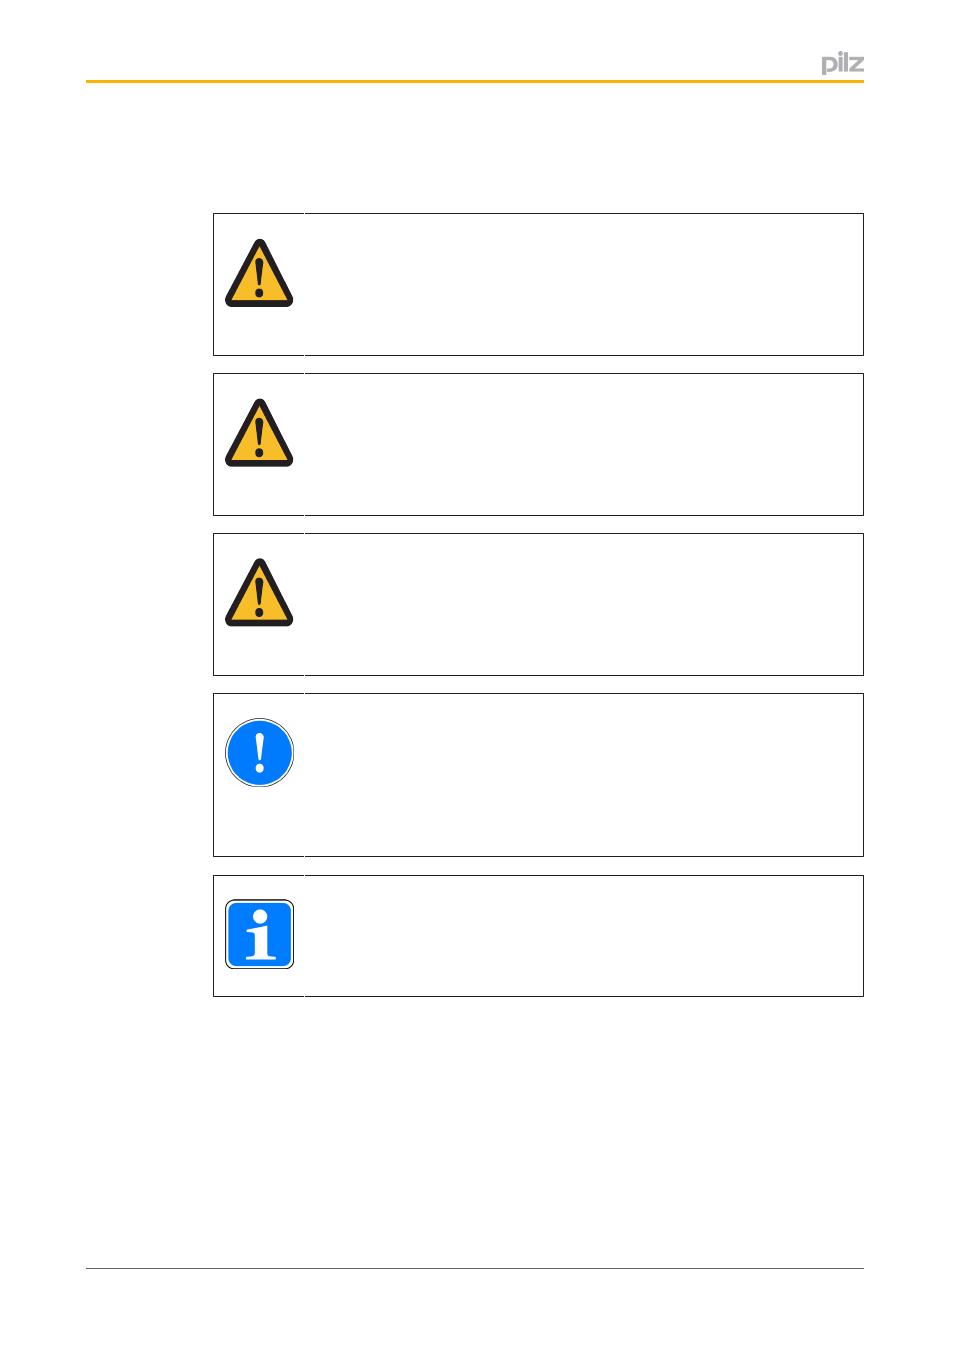 medium resolution of machine tool wiring diagram symbol reference guide wiring diagrams vehicle wiring diagram symbols 2 definition of